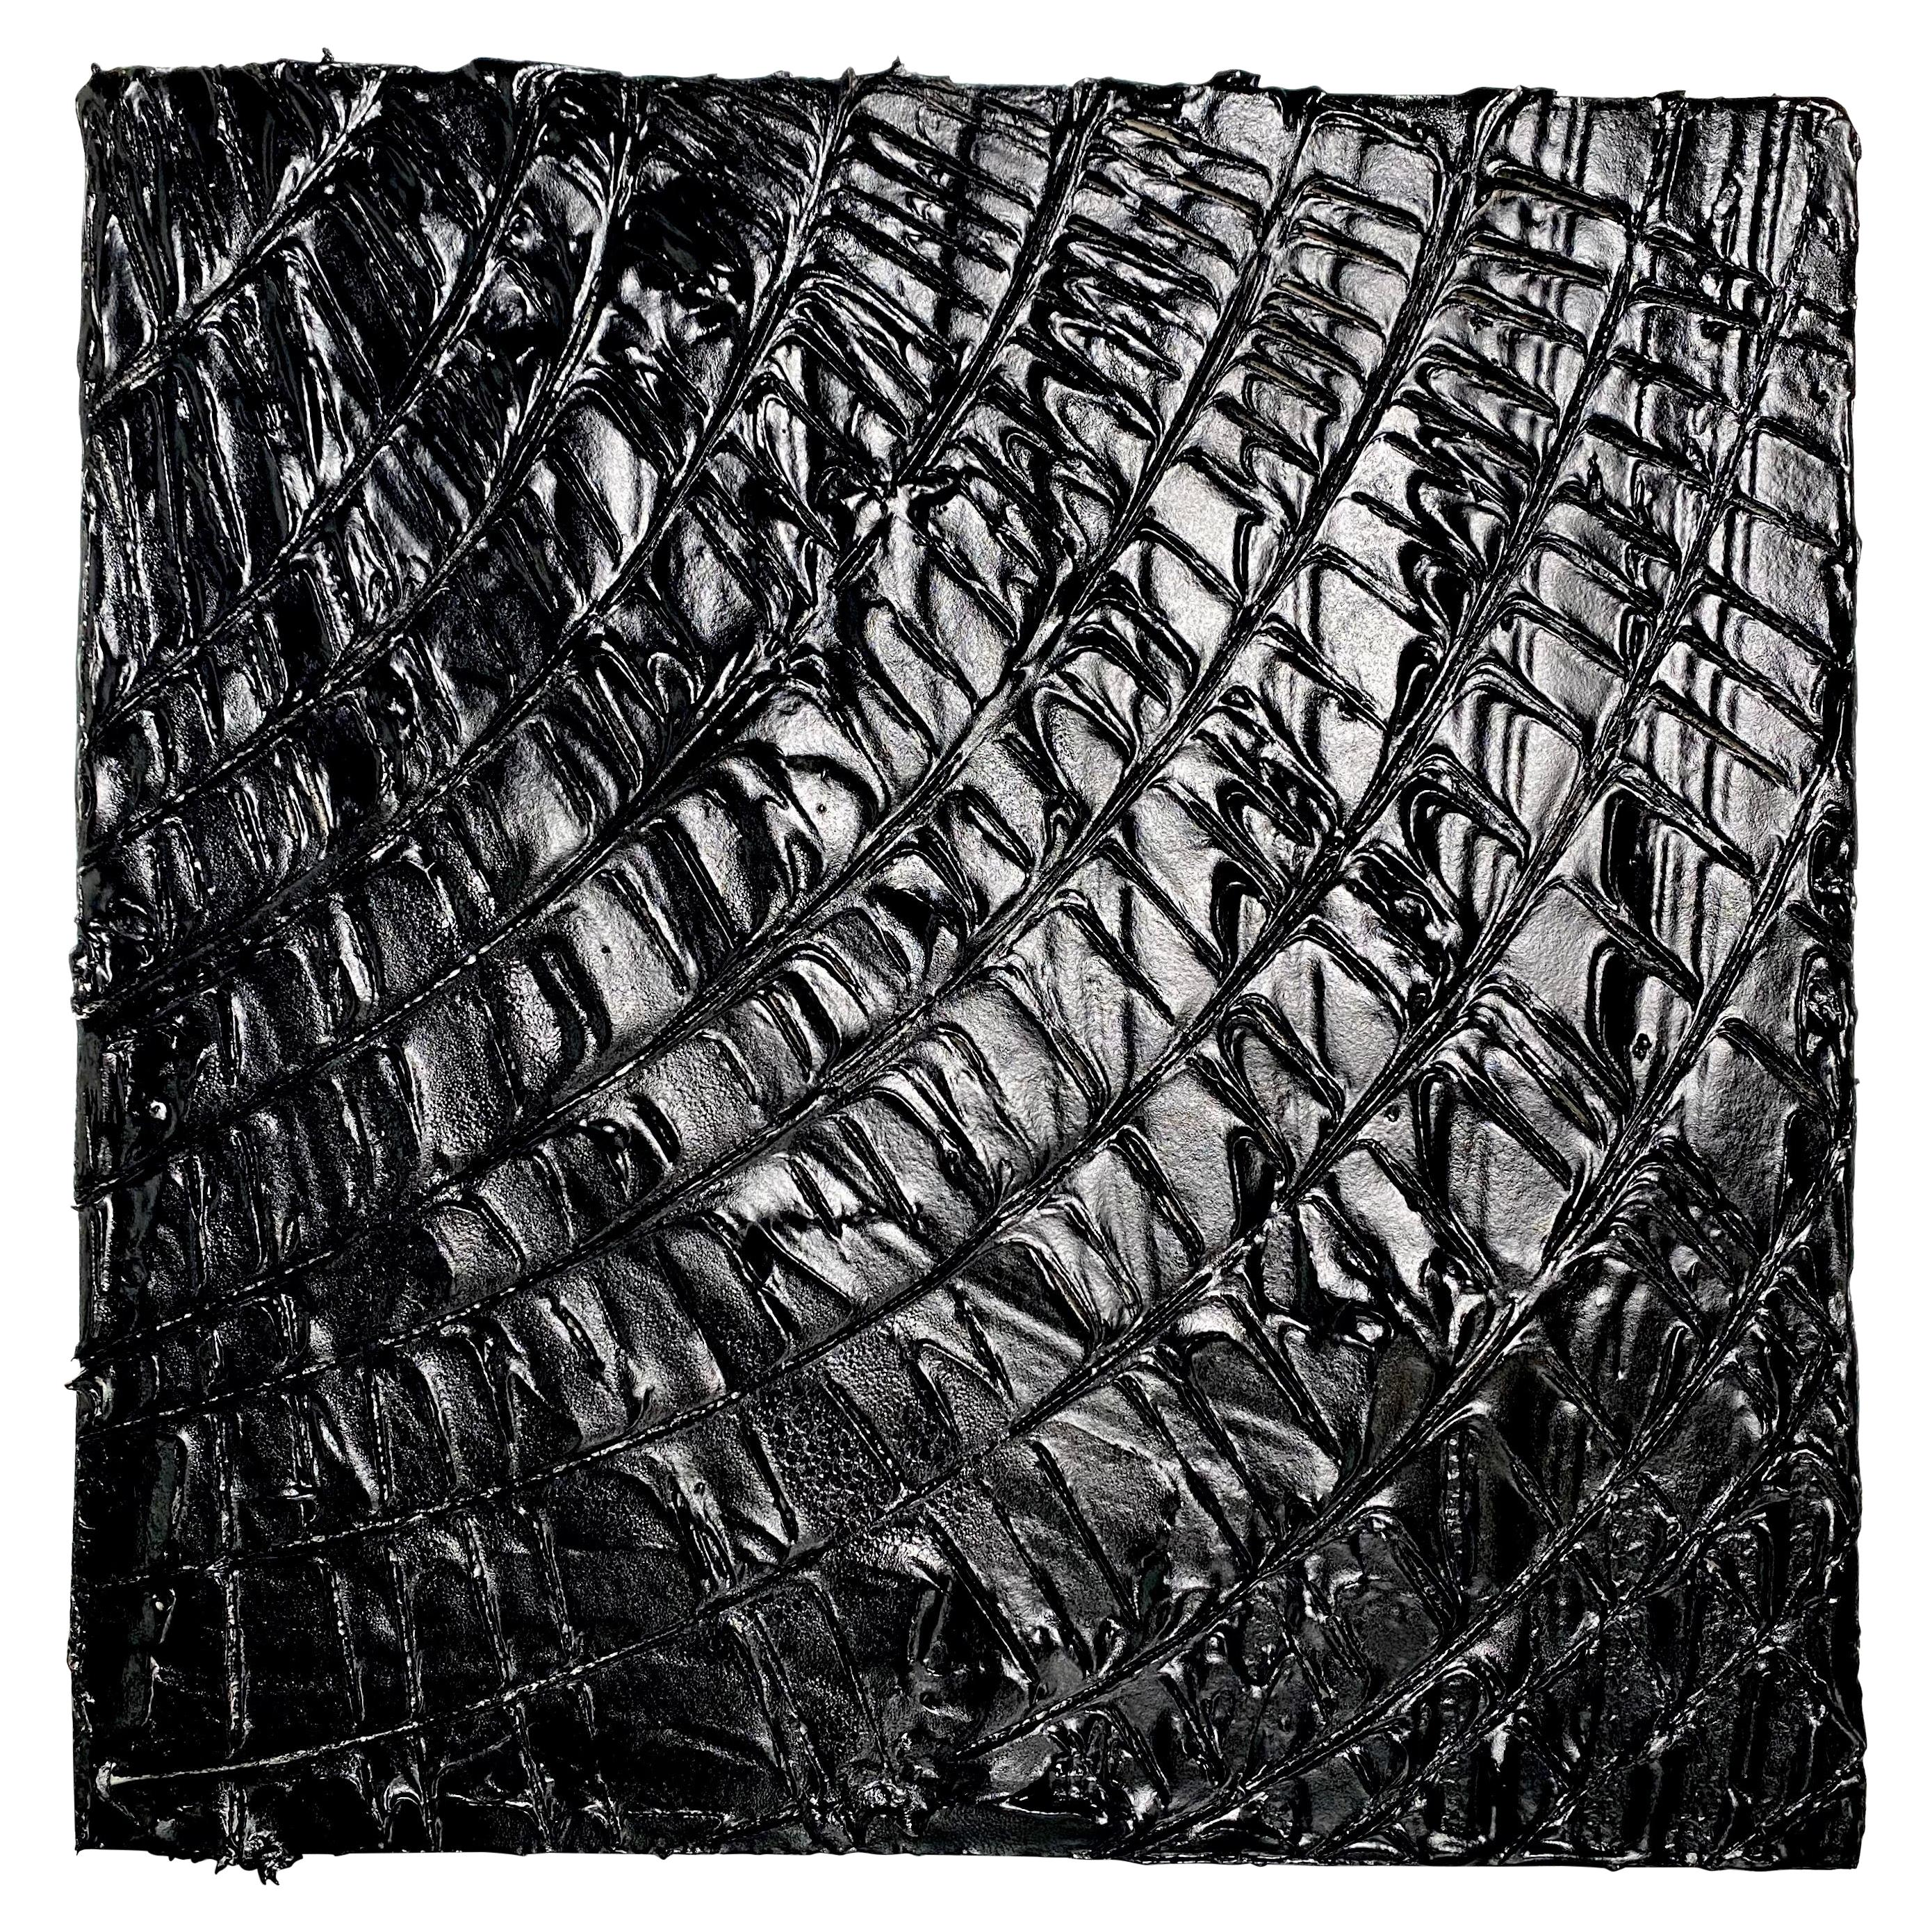 Black Tar Painting, 21st Century by Mattia Biagi